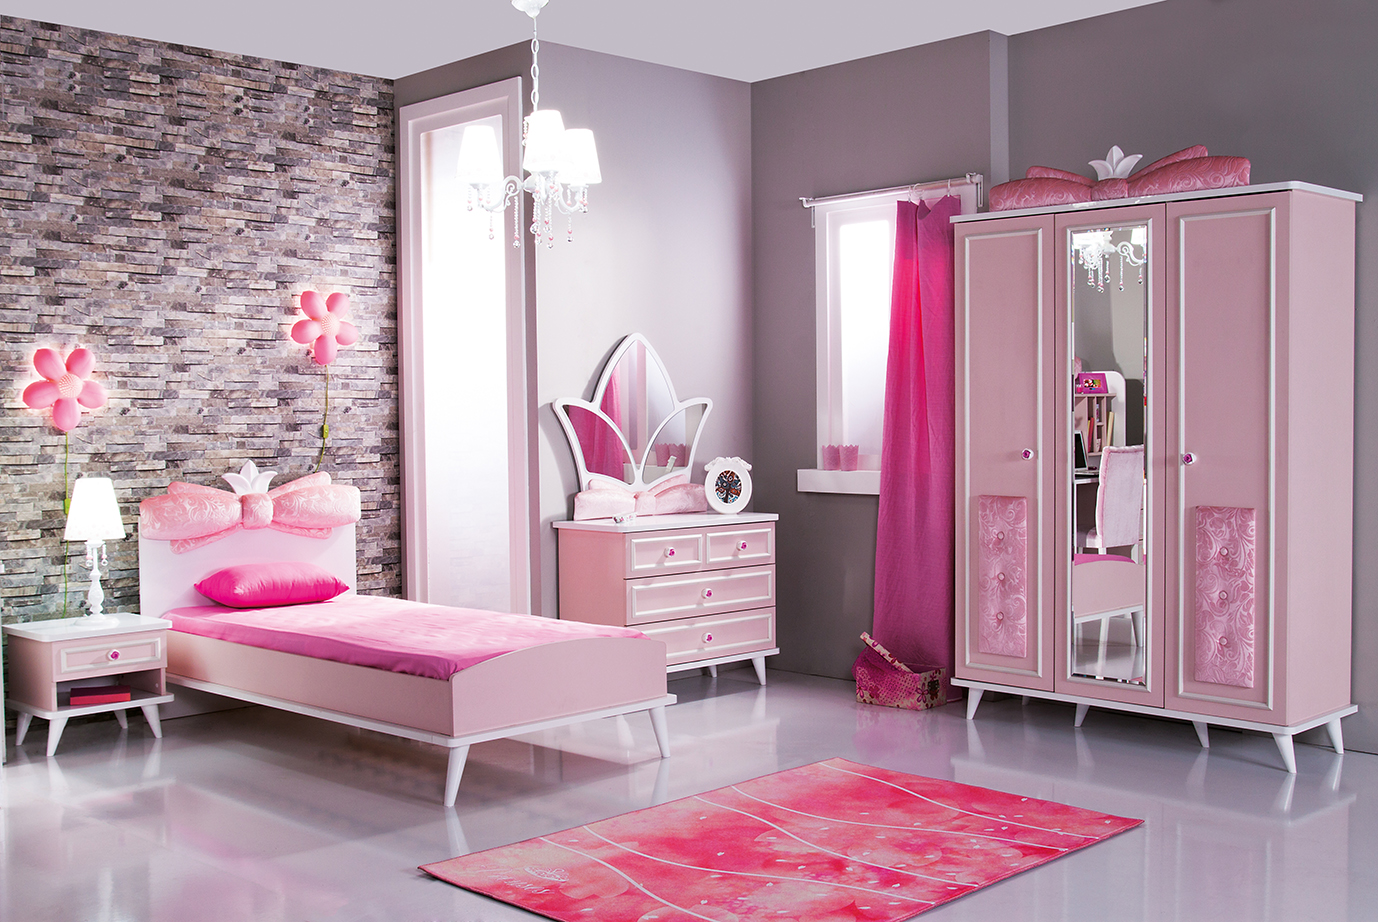 evy kinderkamer meisjeskamer specialist in kinderkamers en slaapkamers, Deco ideeën